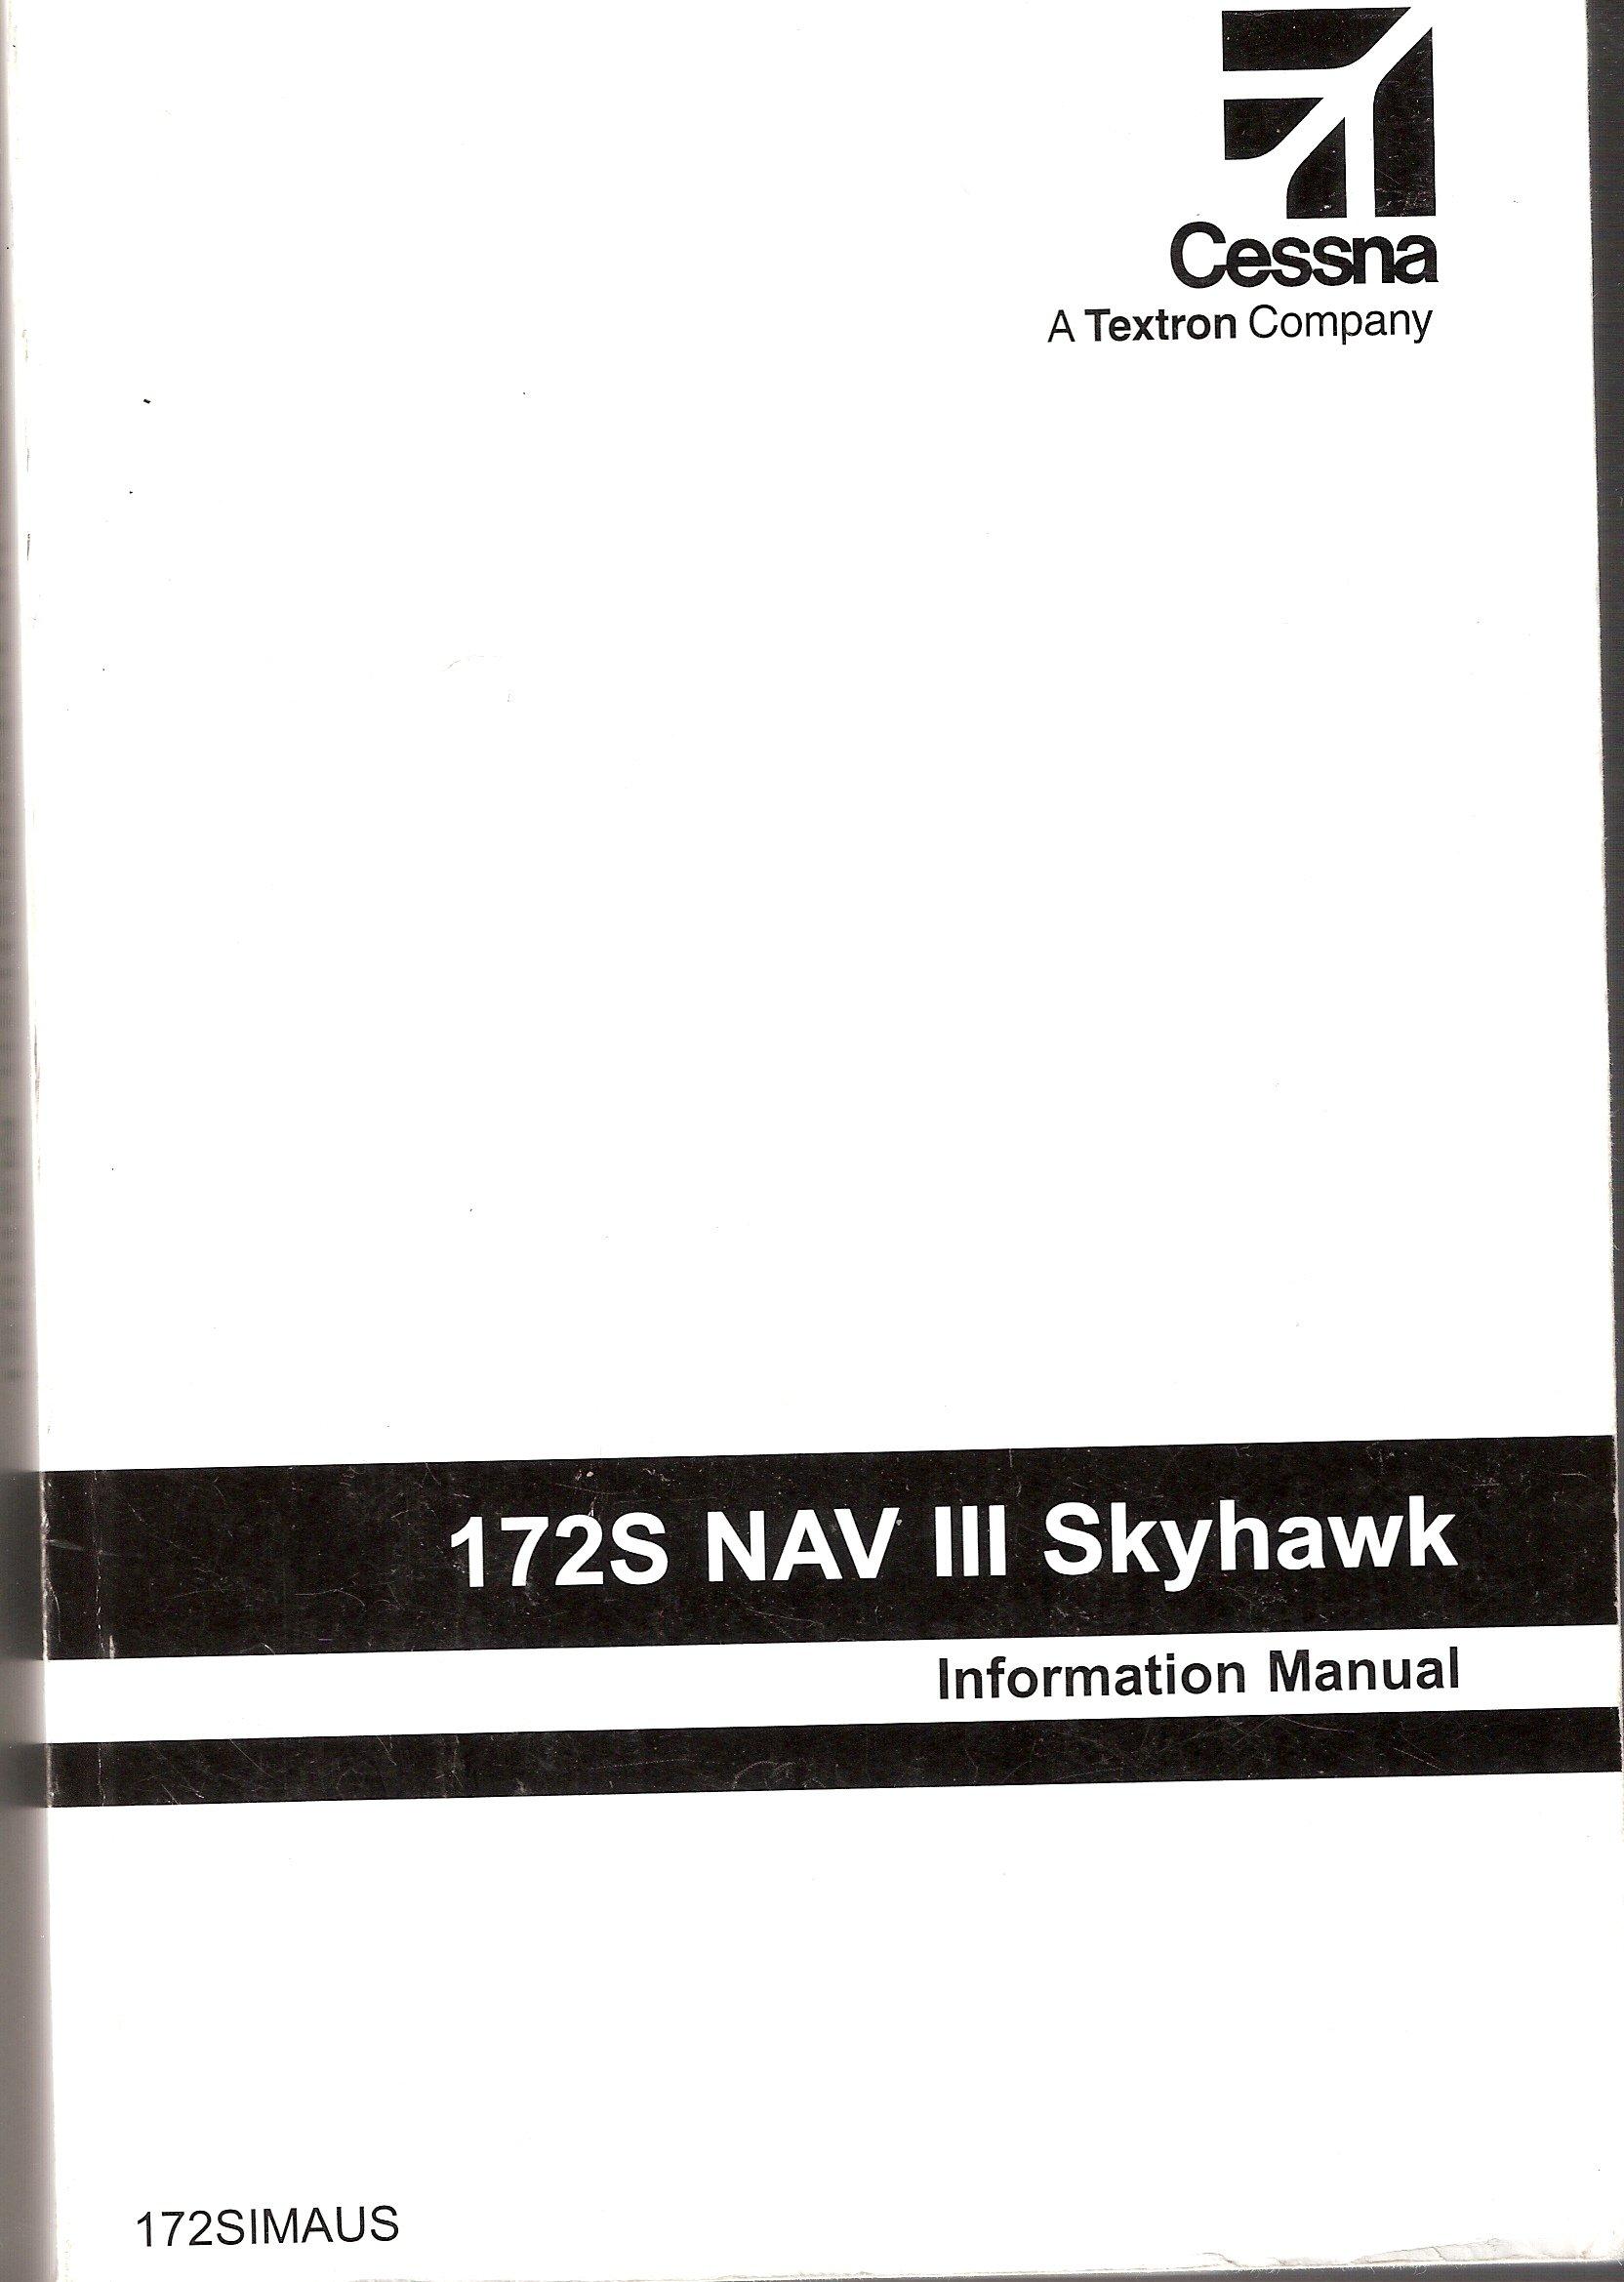 172S NAV III Skyhawk Information Manual: Cessna Aircraft